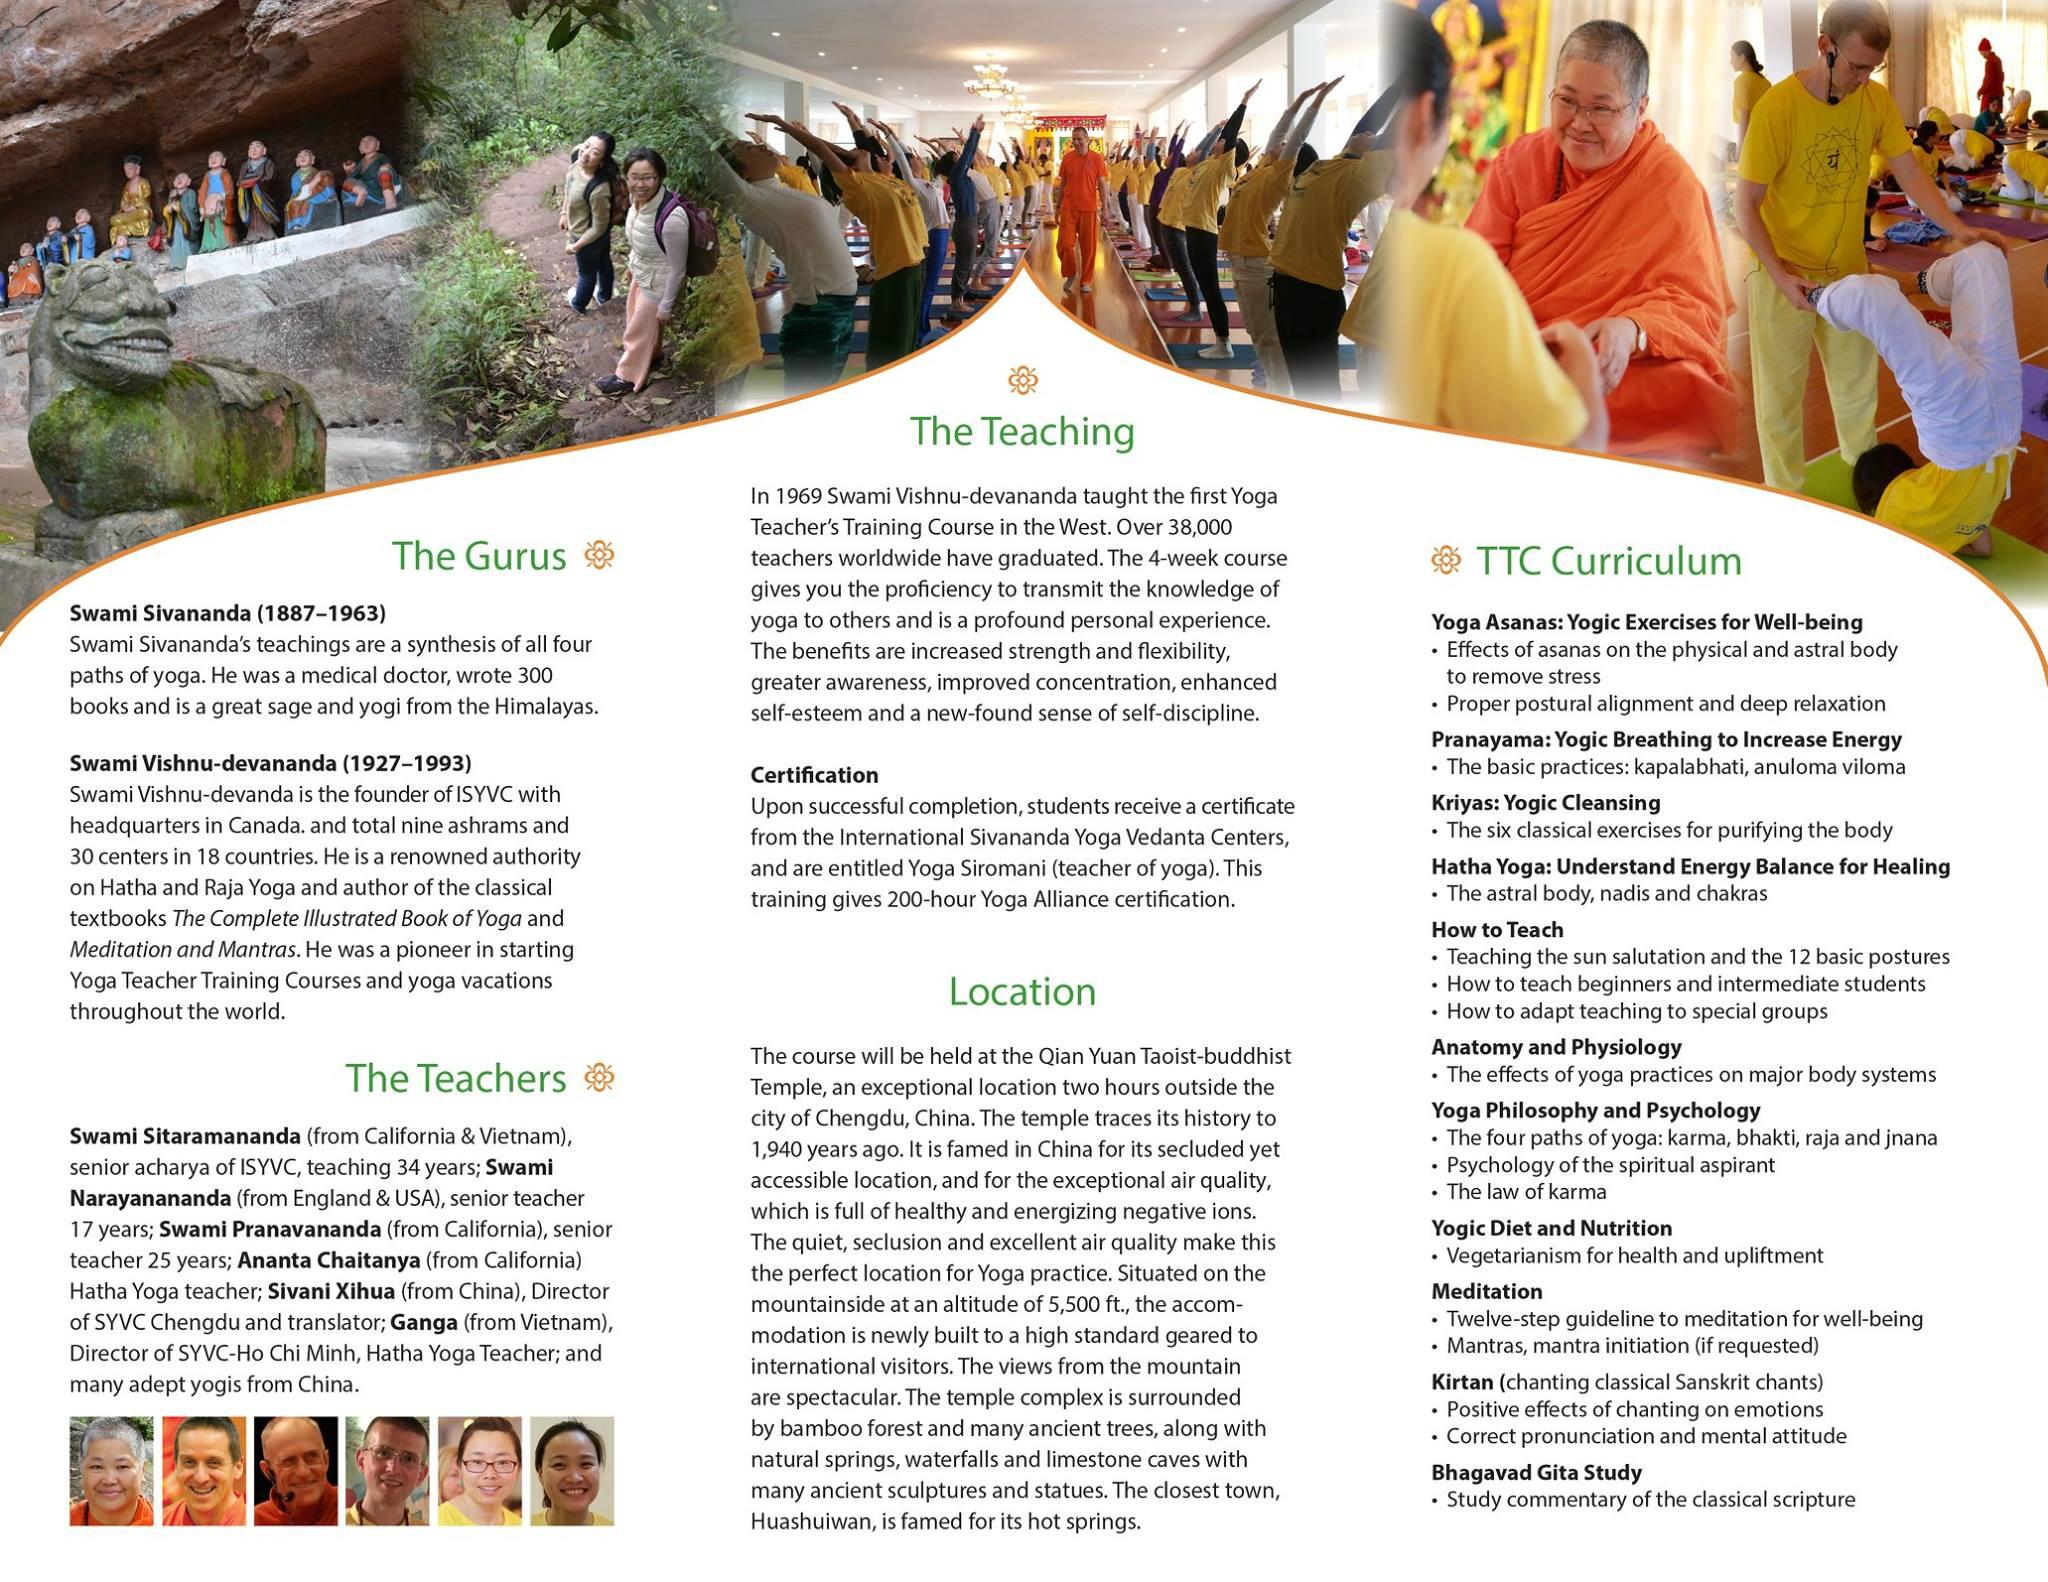 sivananda-ashram-yoga-farm-california-12